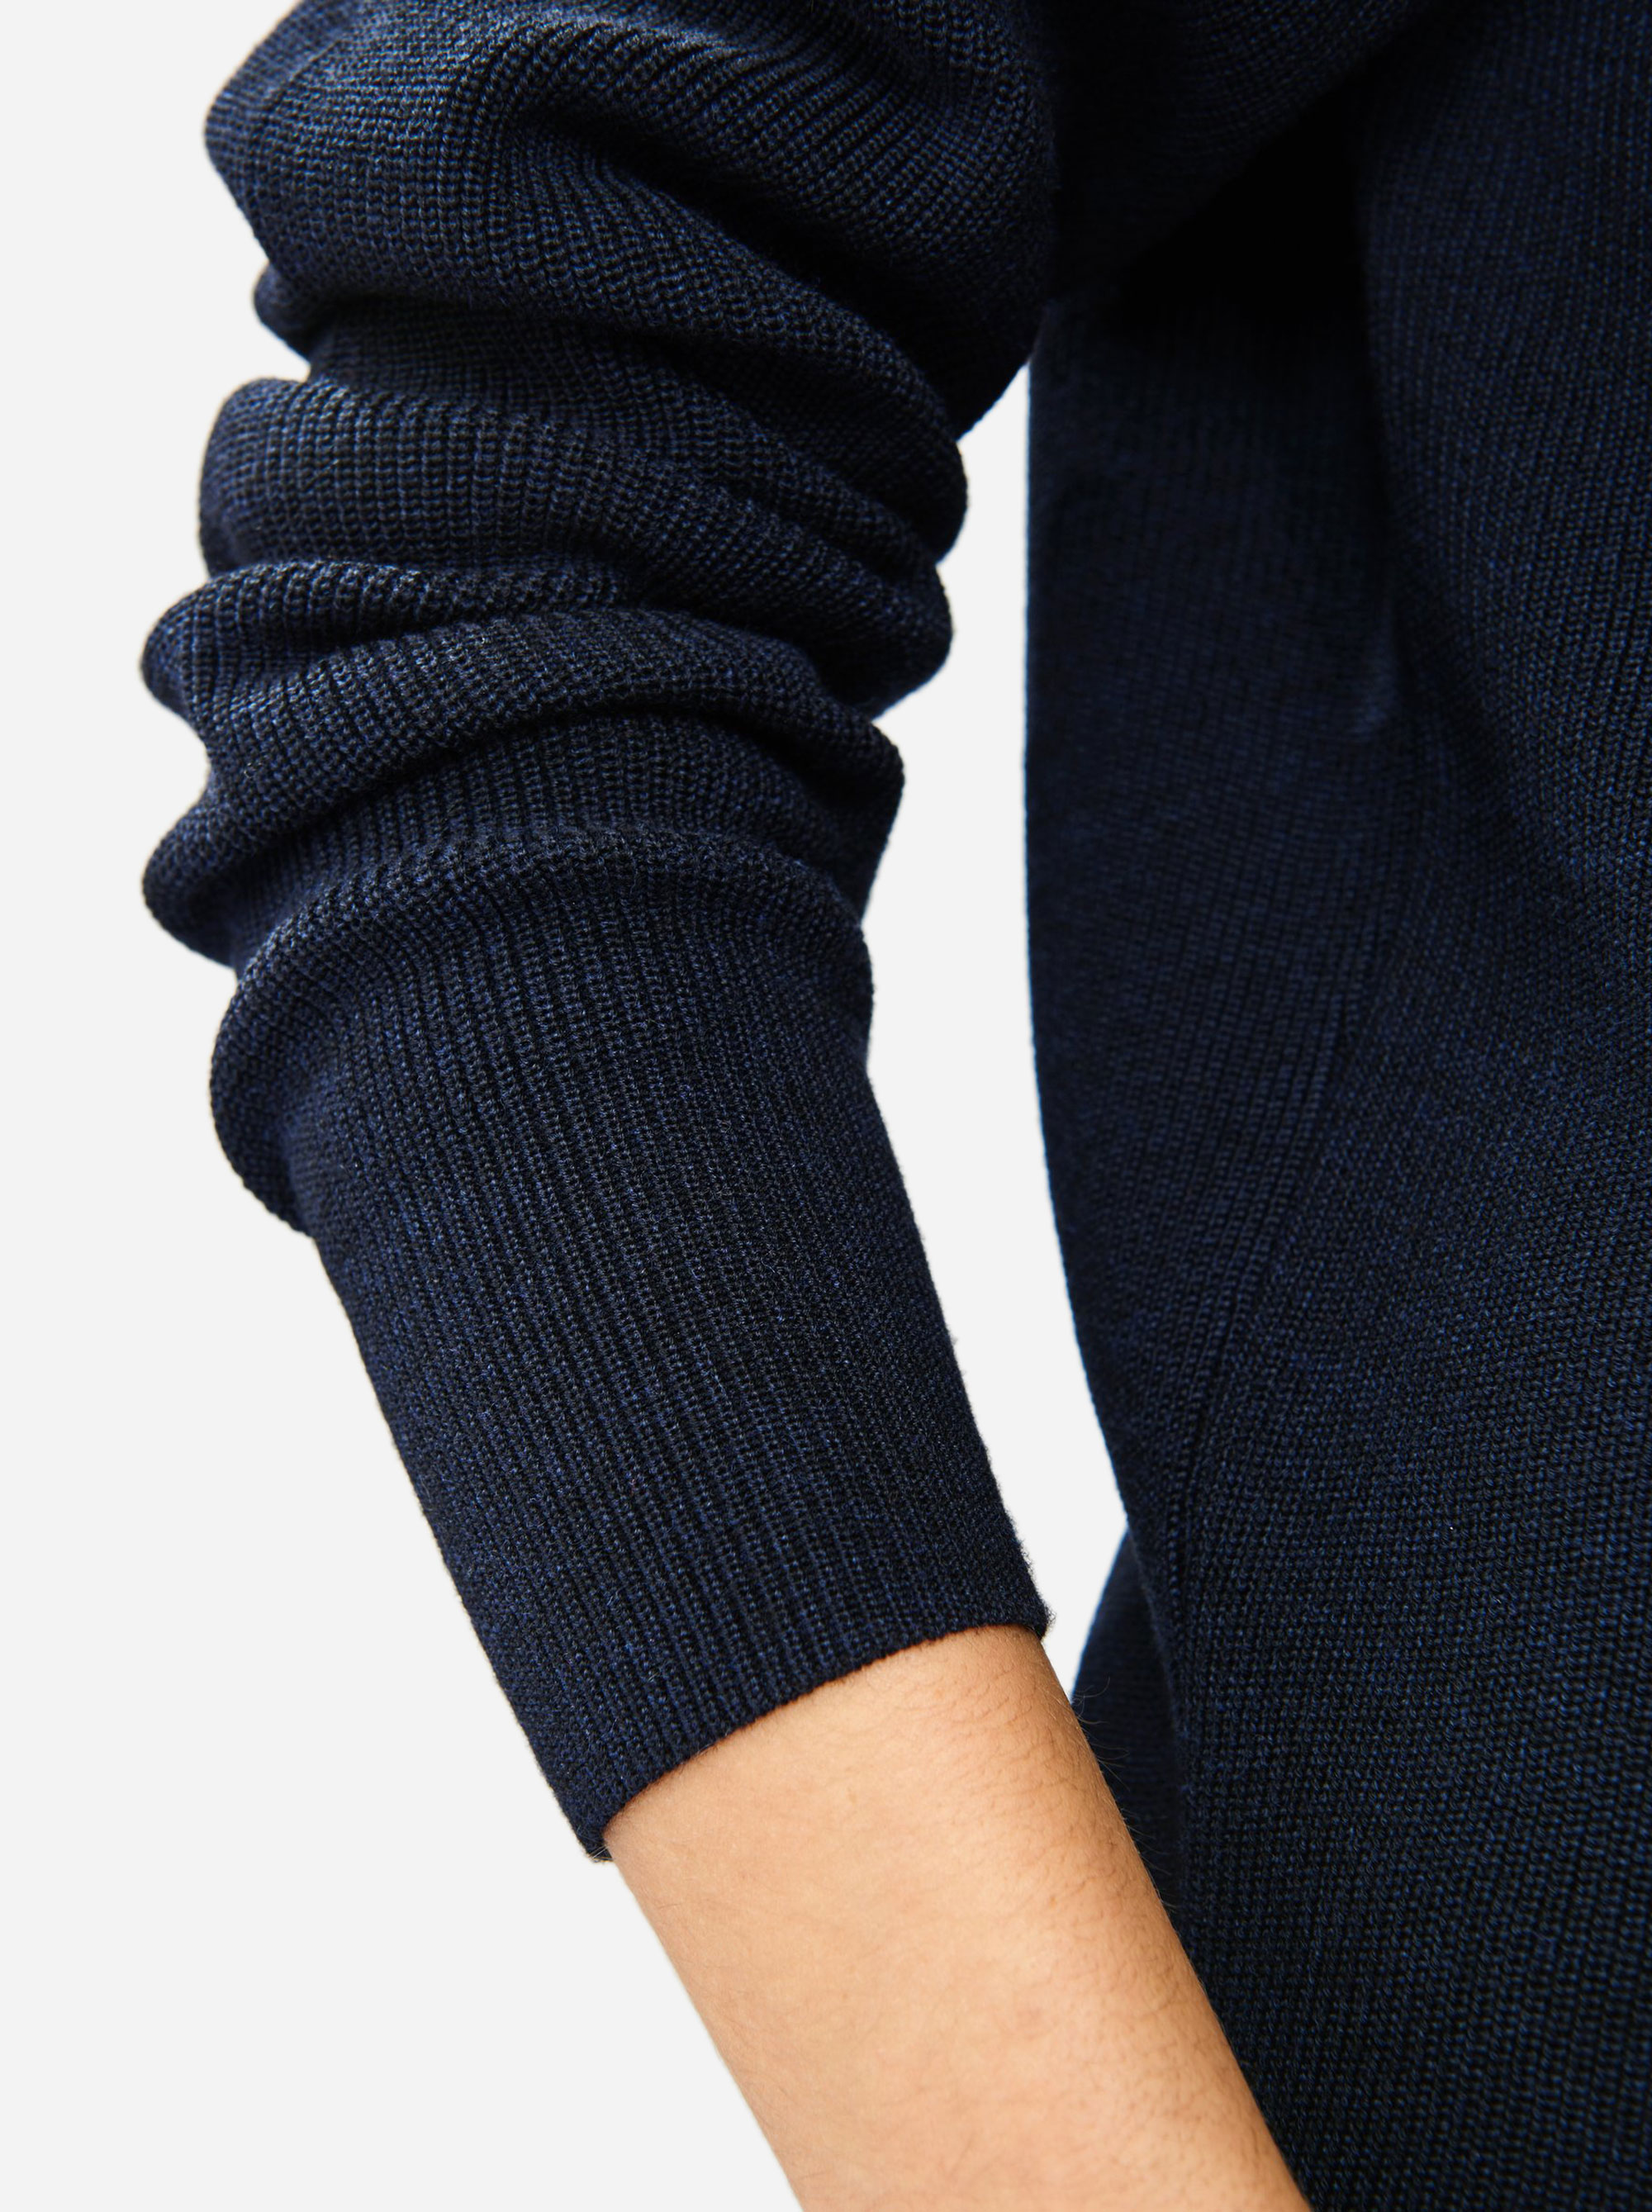 Teym - Crewneck - The Merino Sweater - Women - Blue - 3